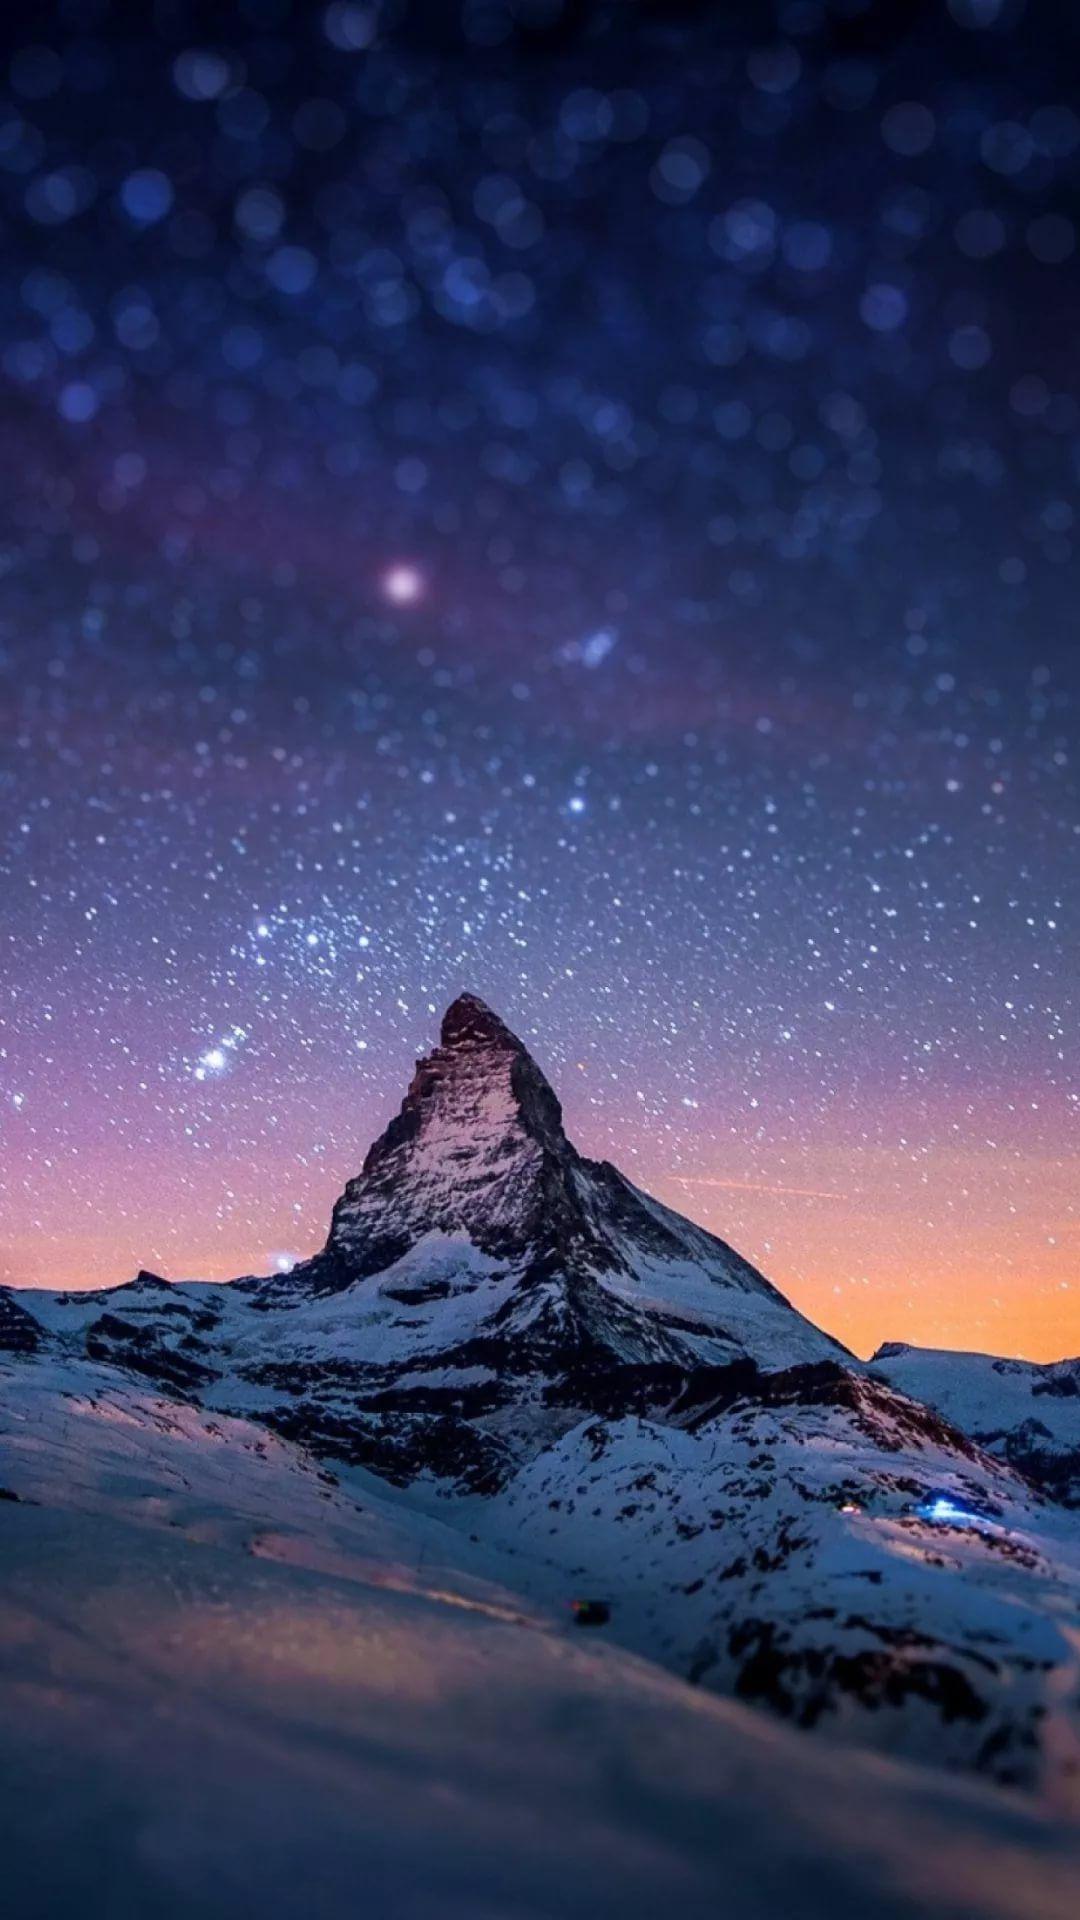 Mountain Wallpaper hd